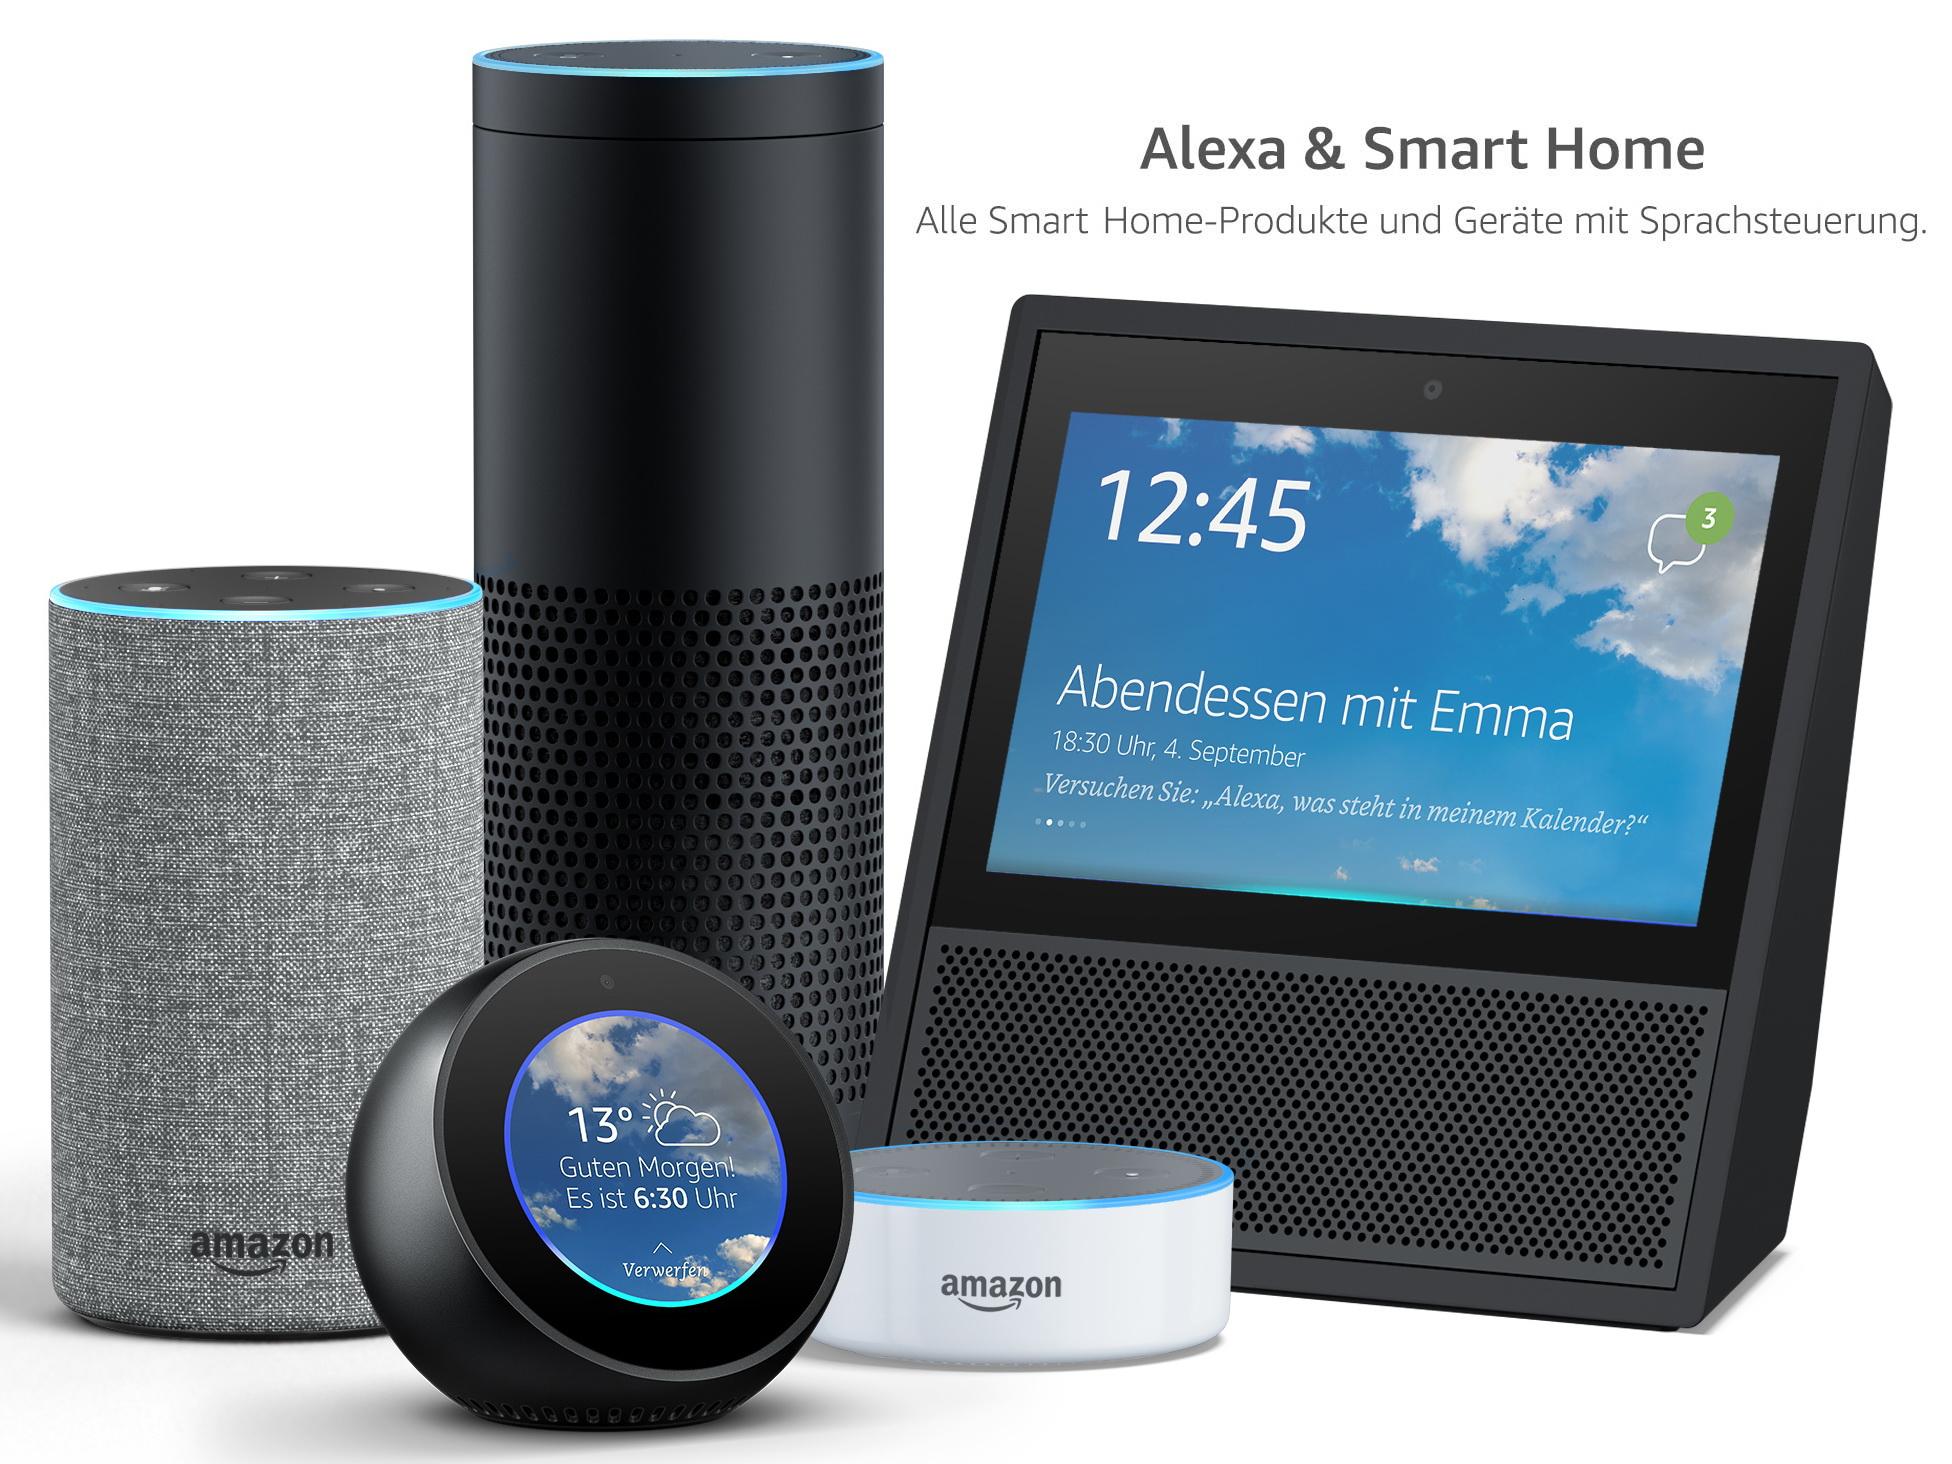 amazon smart home shop zentrale anlaufstelle f r echo und alexa kompatible ger te. Black Bedroom Furniture Sets. Home Design Ideas